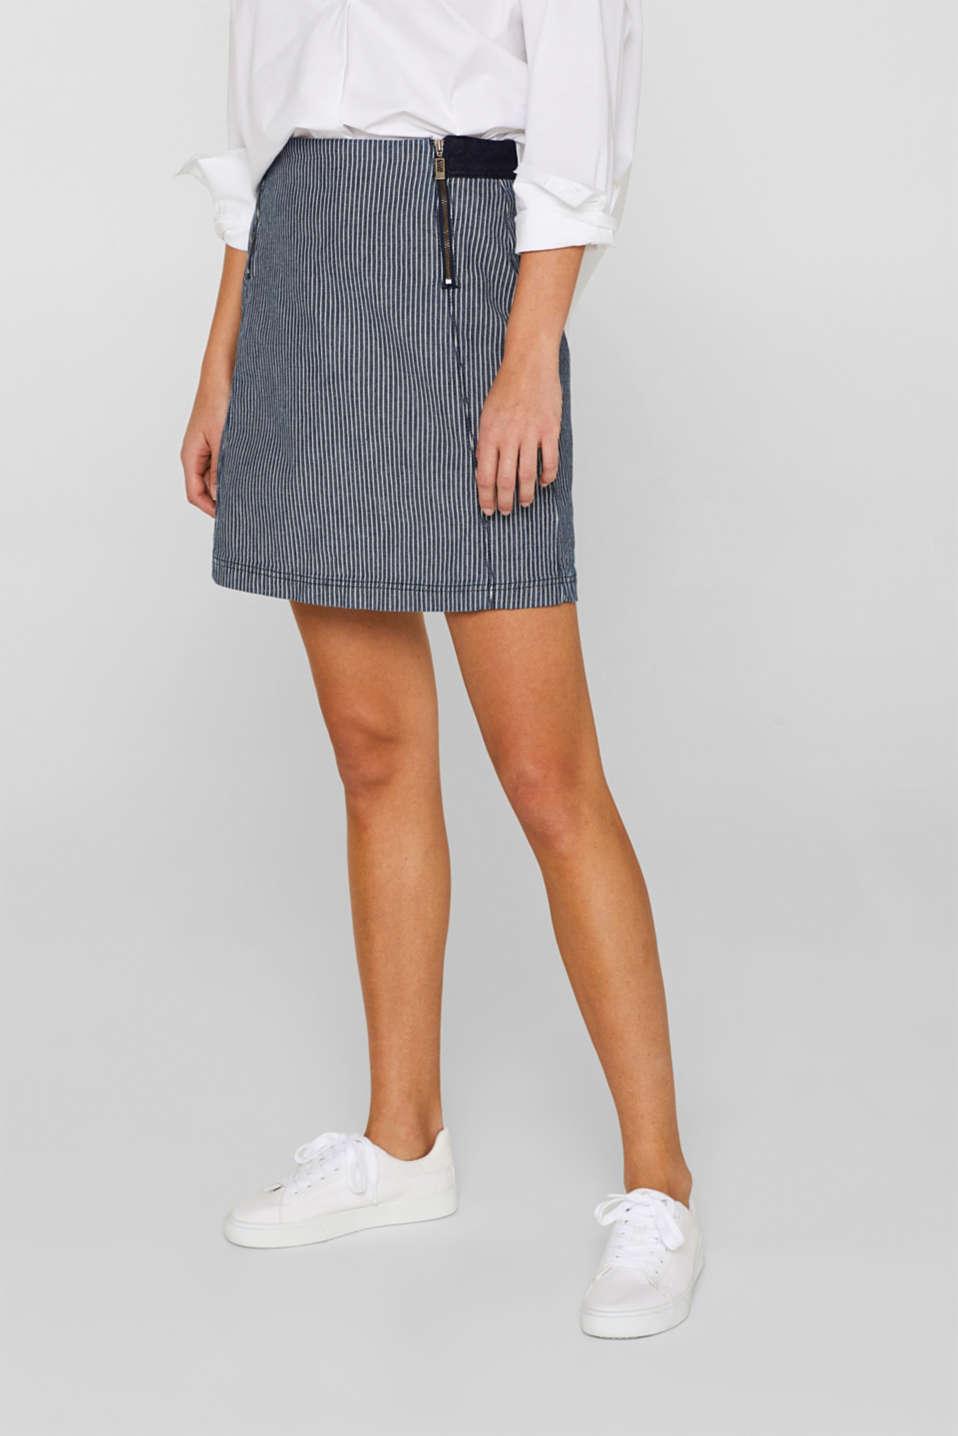 Stretch denim skirt with striped pattern